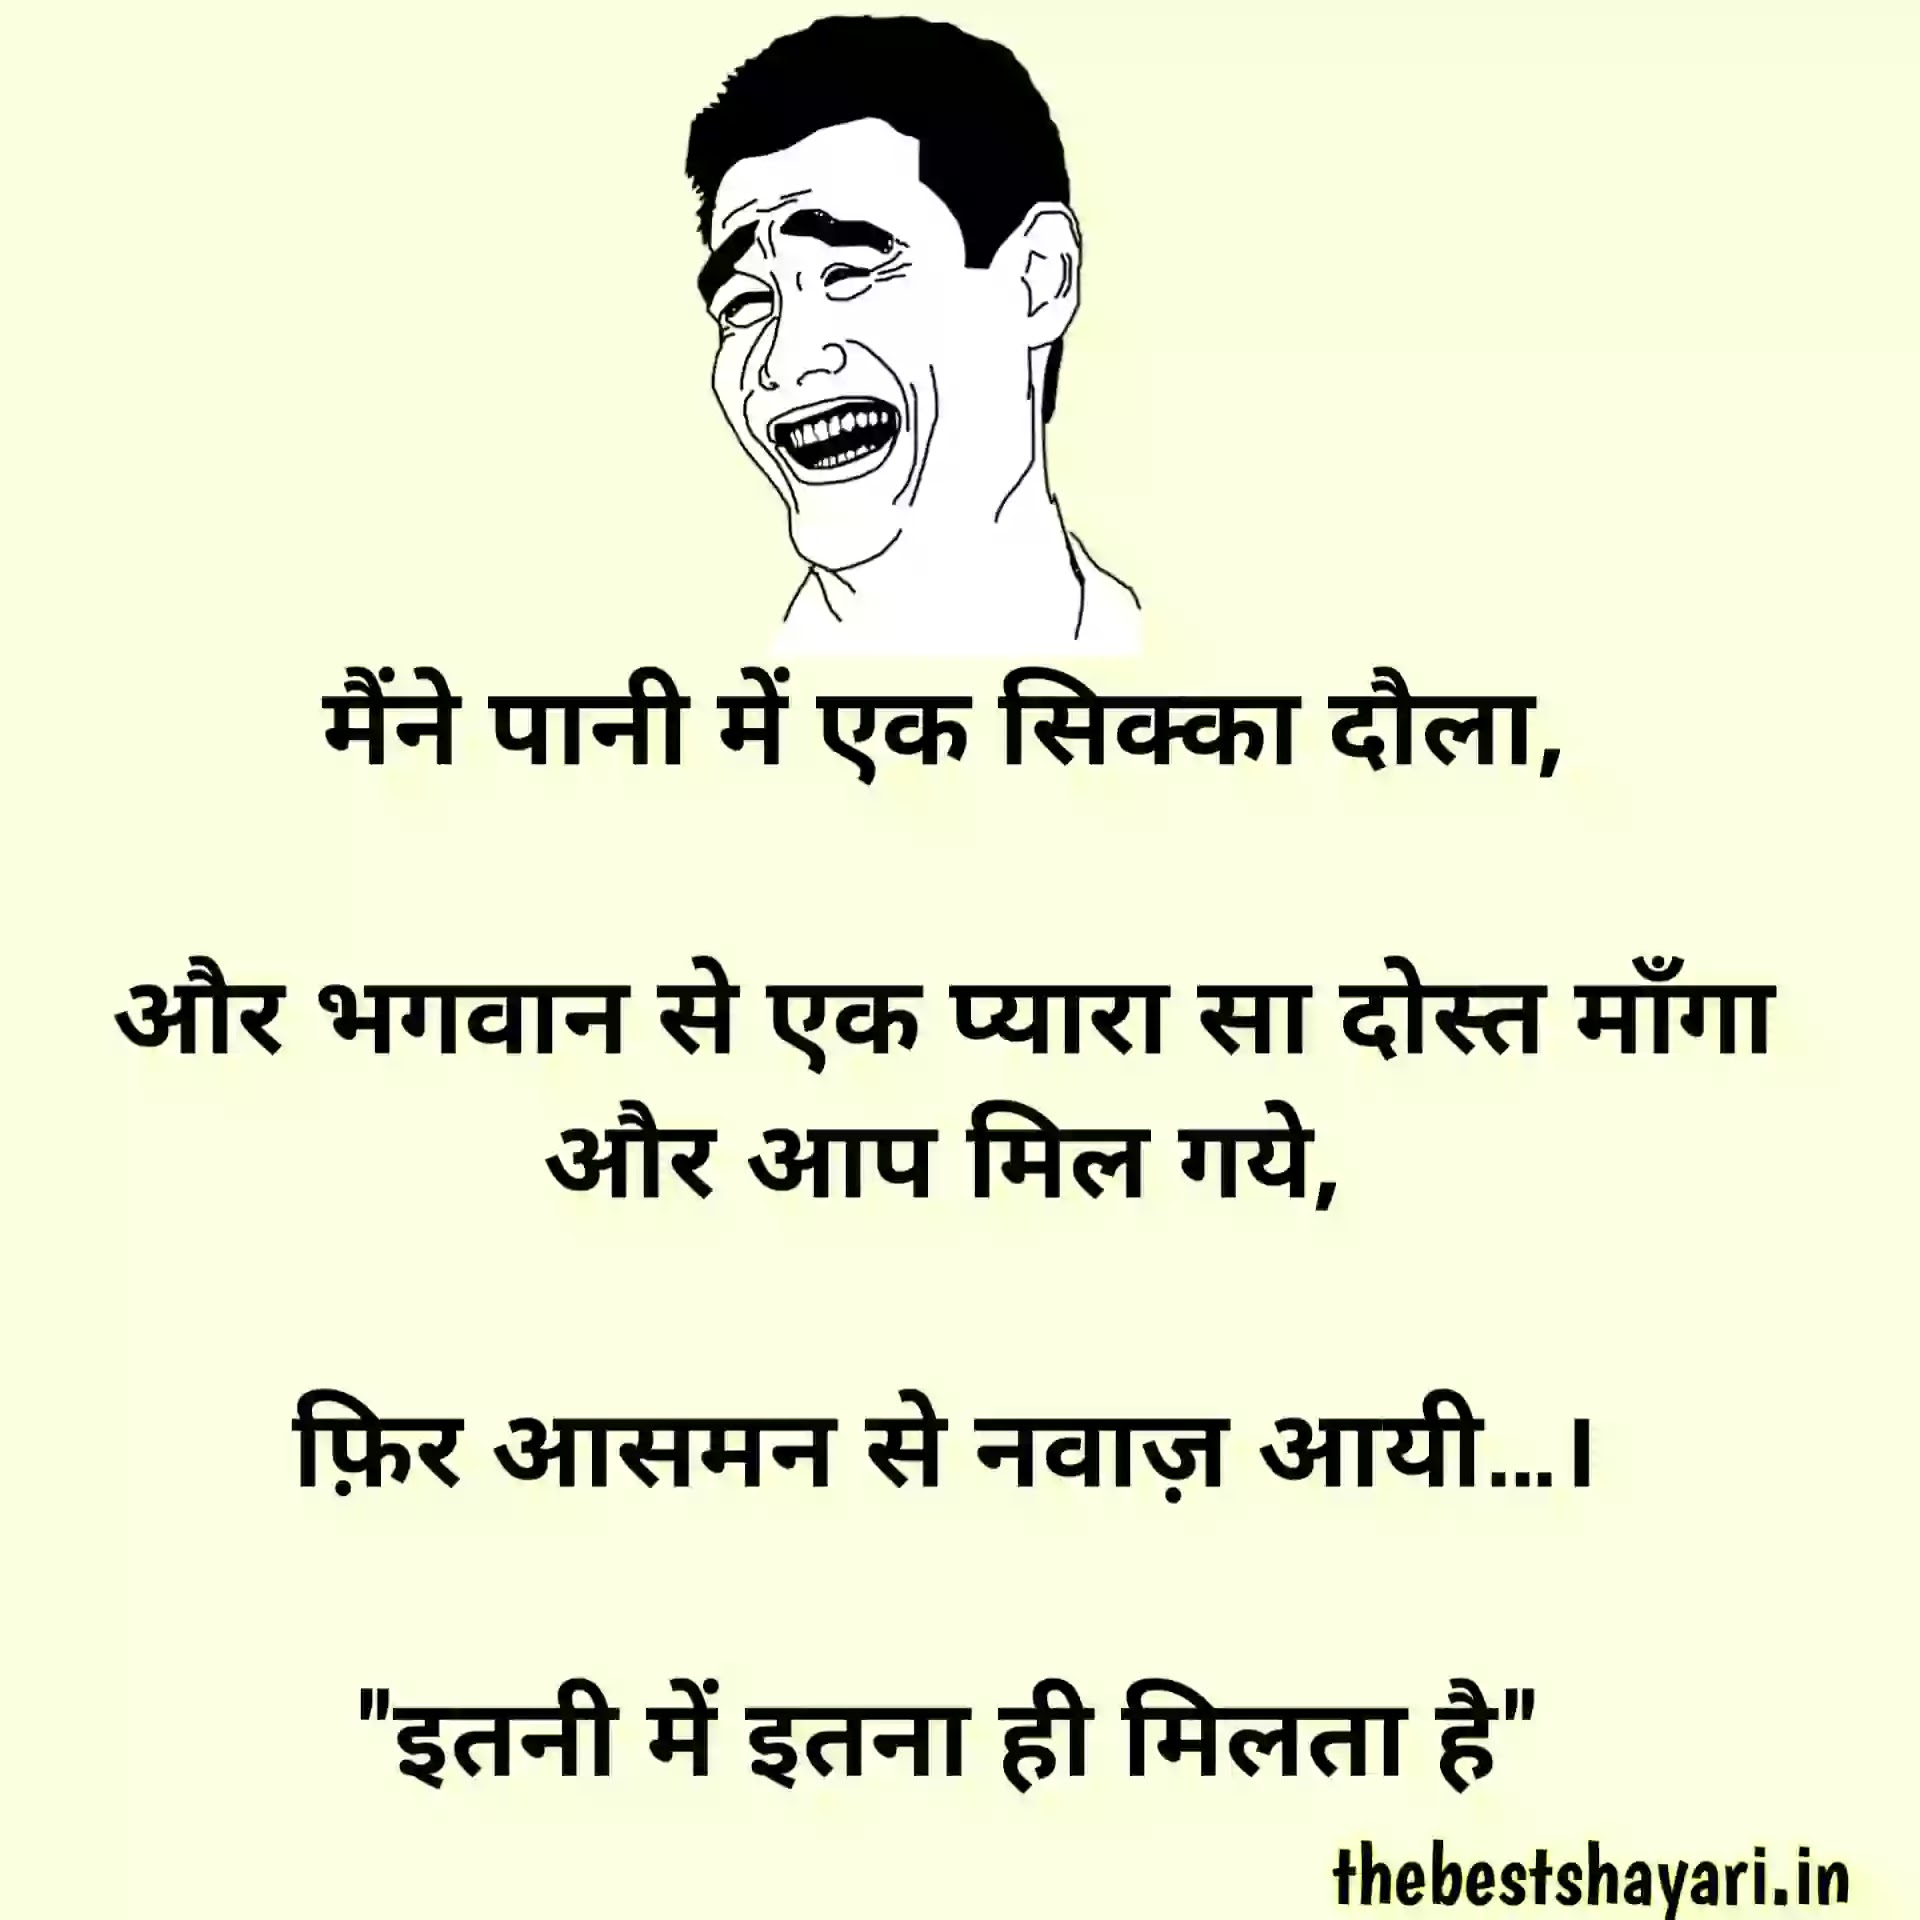 Jokes for friendship in Hindi